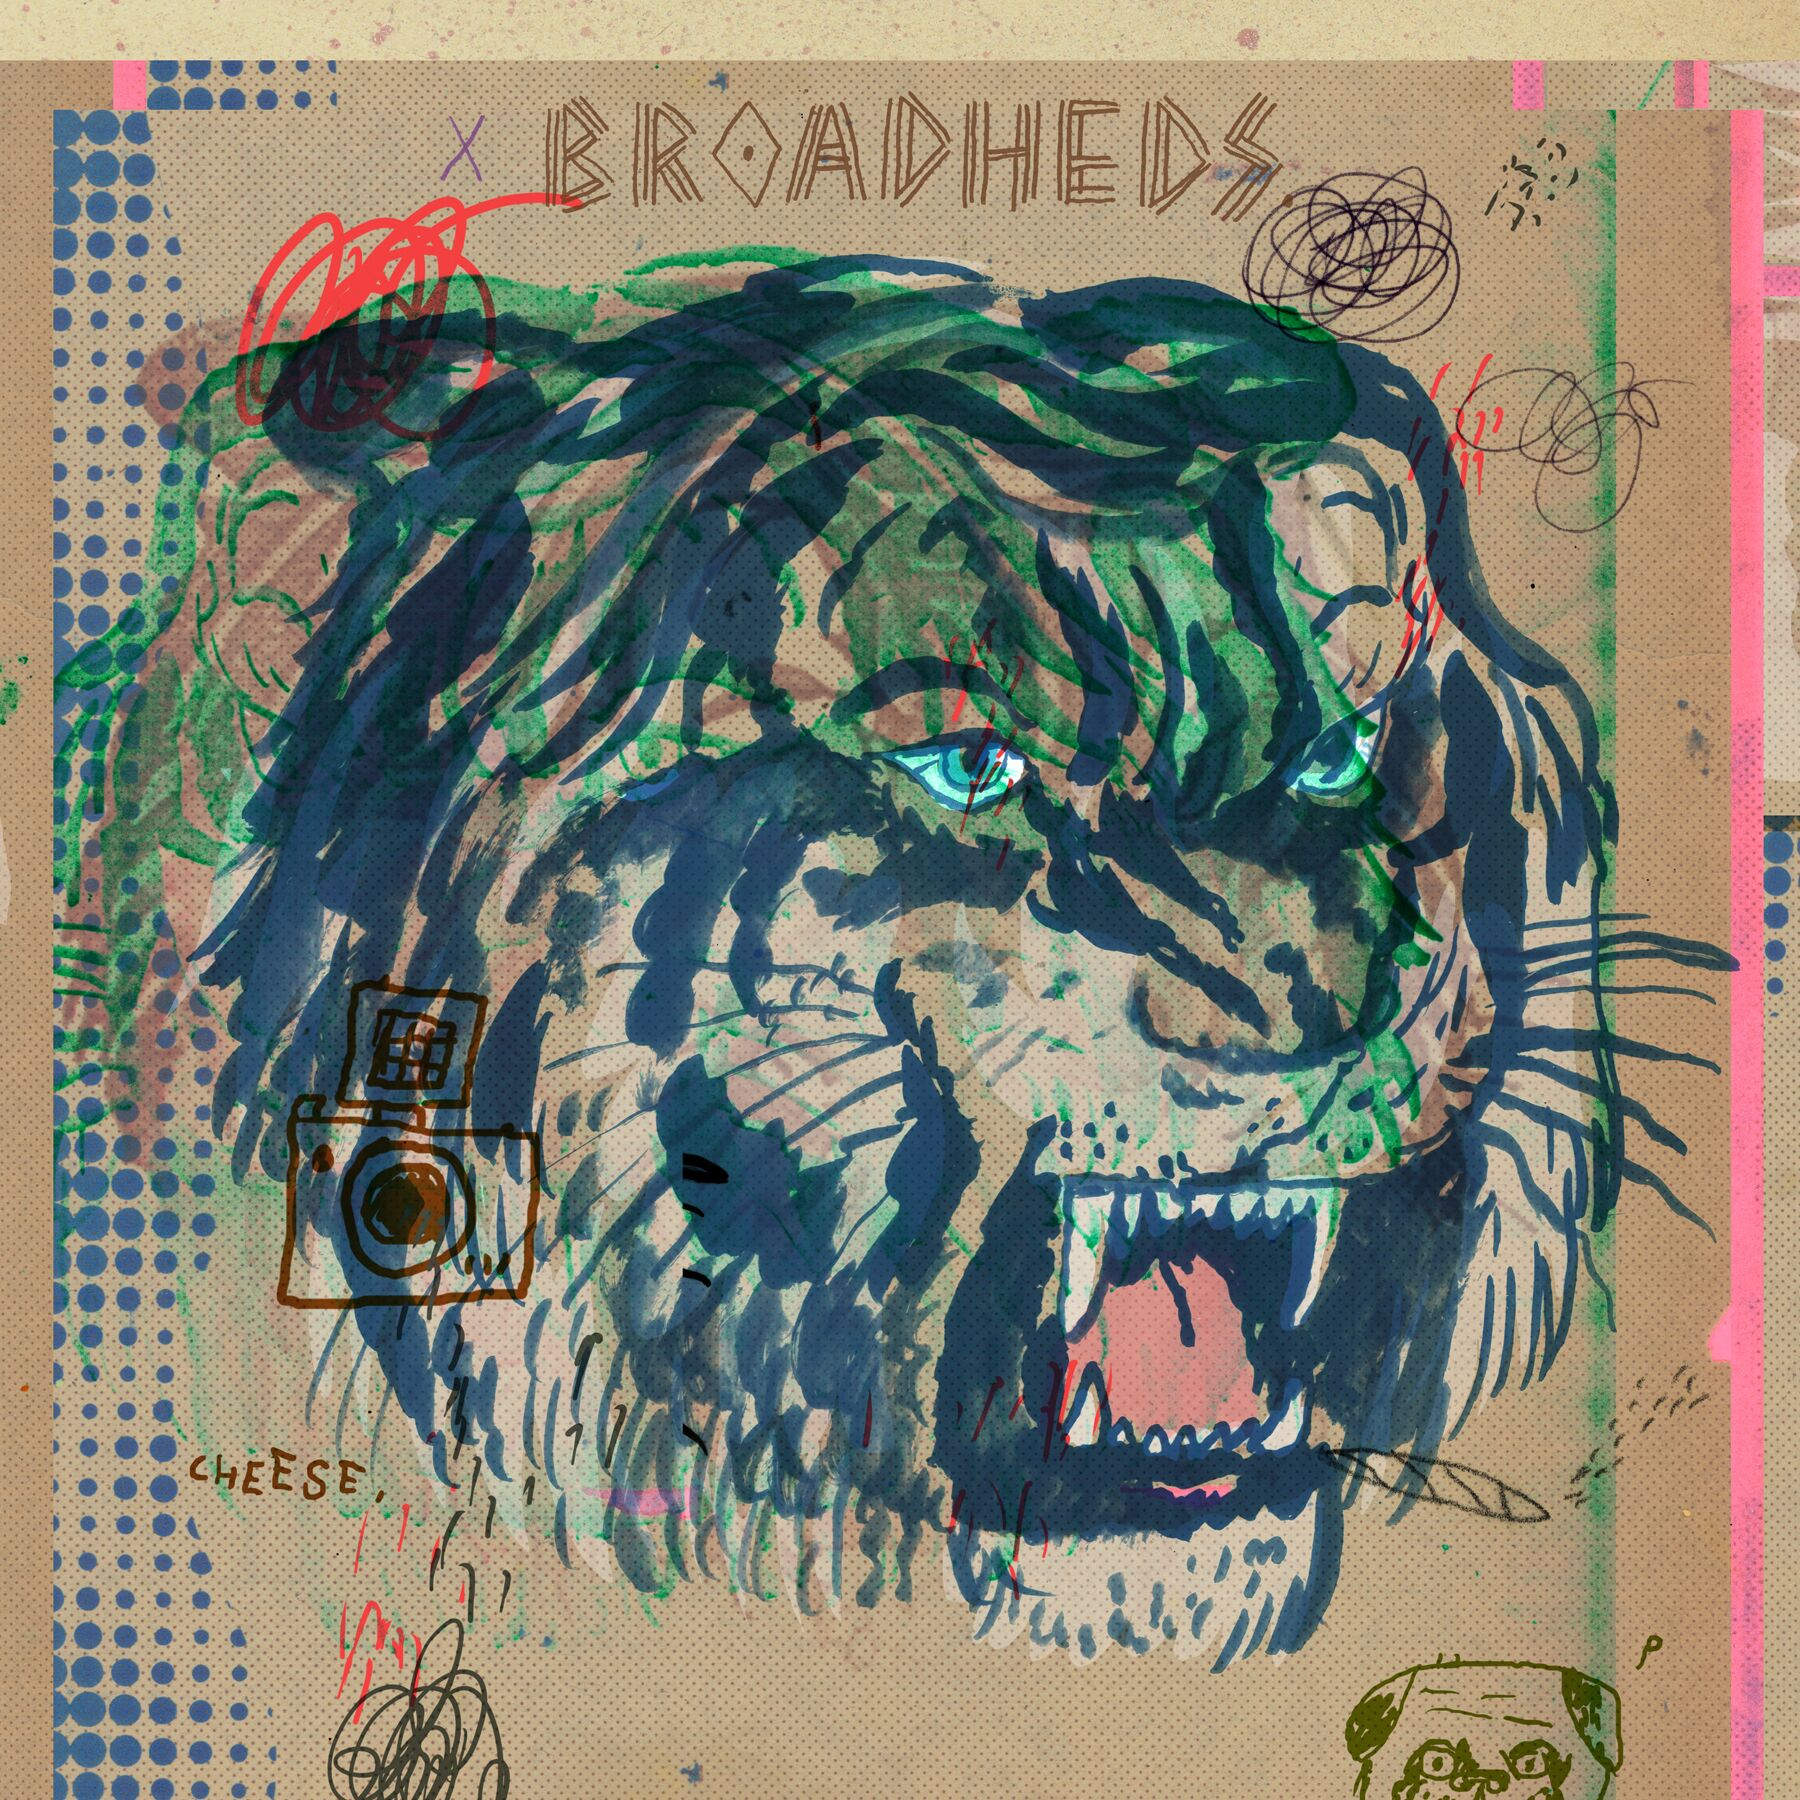 Broadheds - Broadheds - Digital